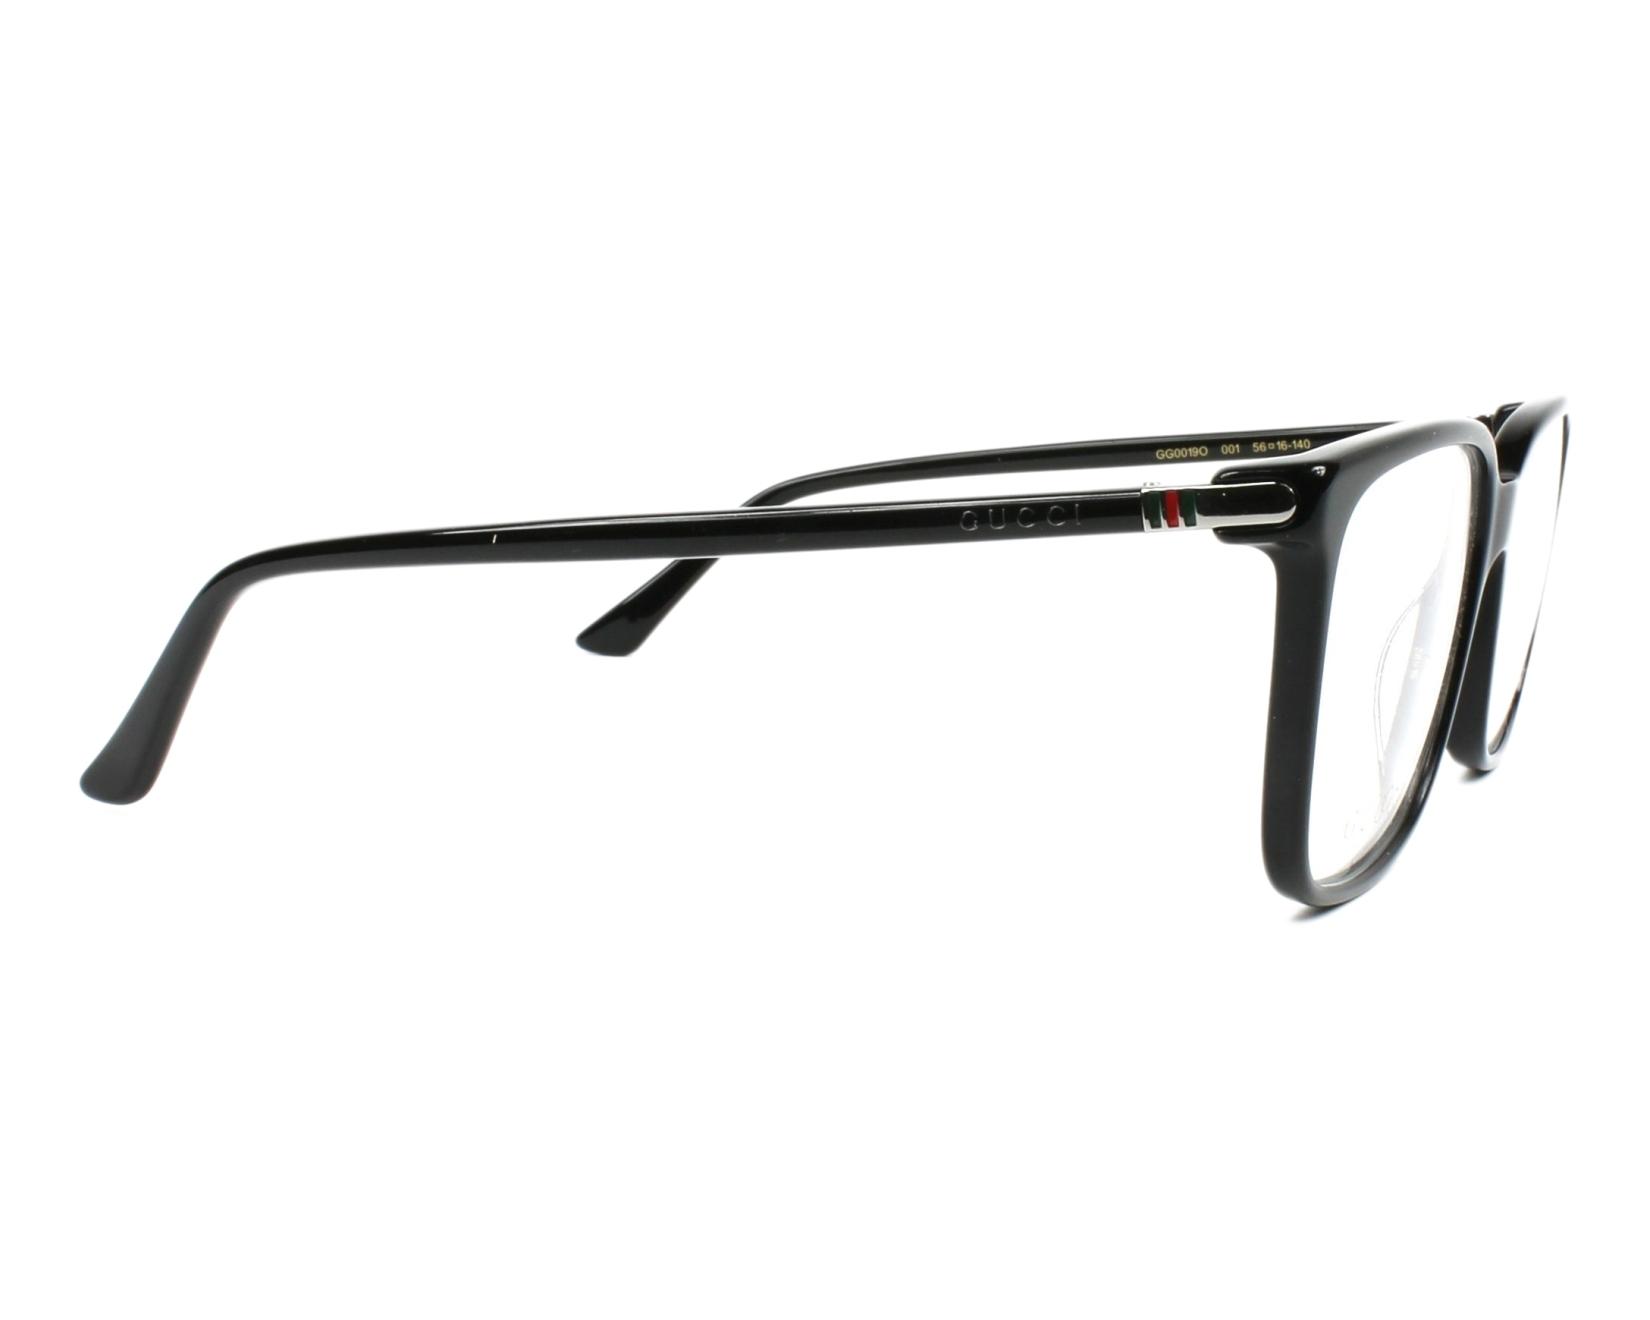 bfc184d4c28 eyeglasses Gucci GG-00190 001 56-16 Black side view